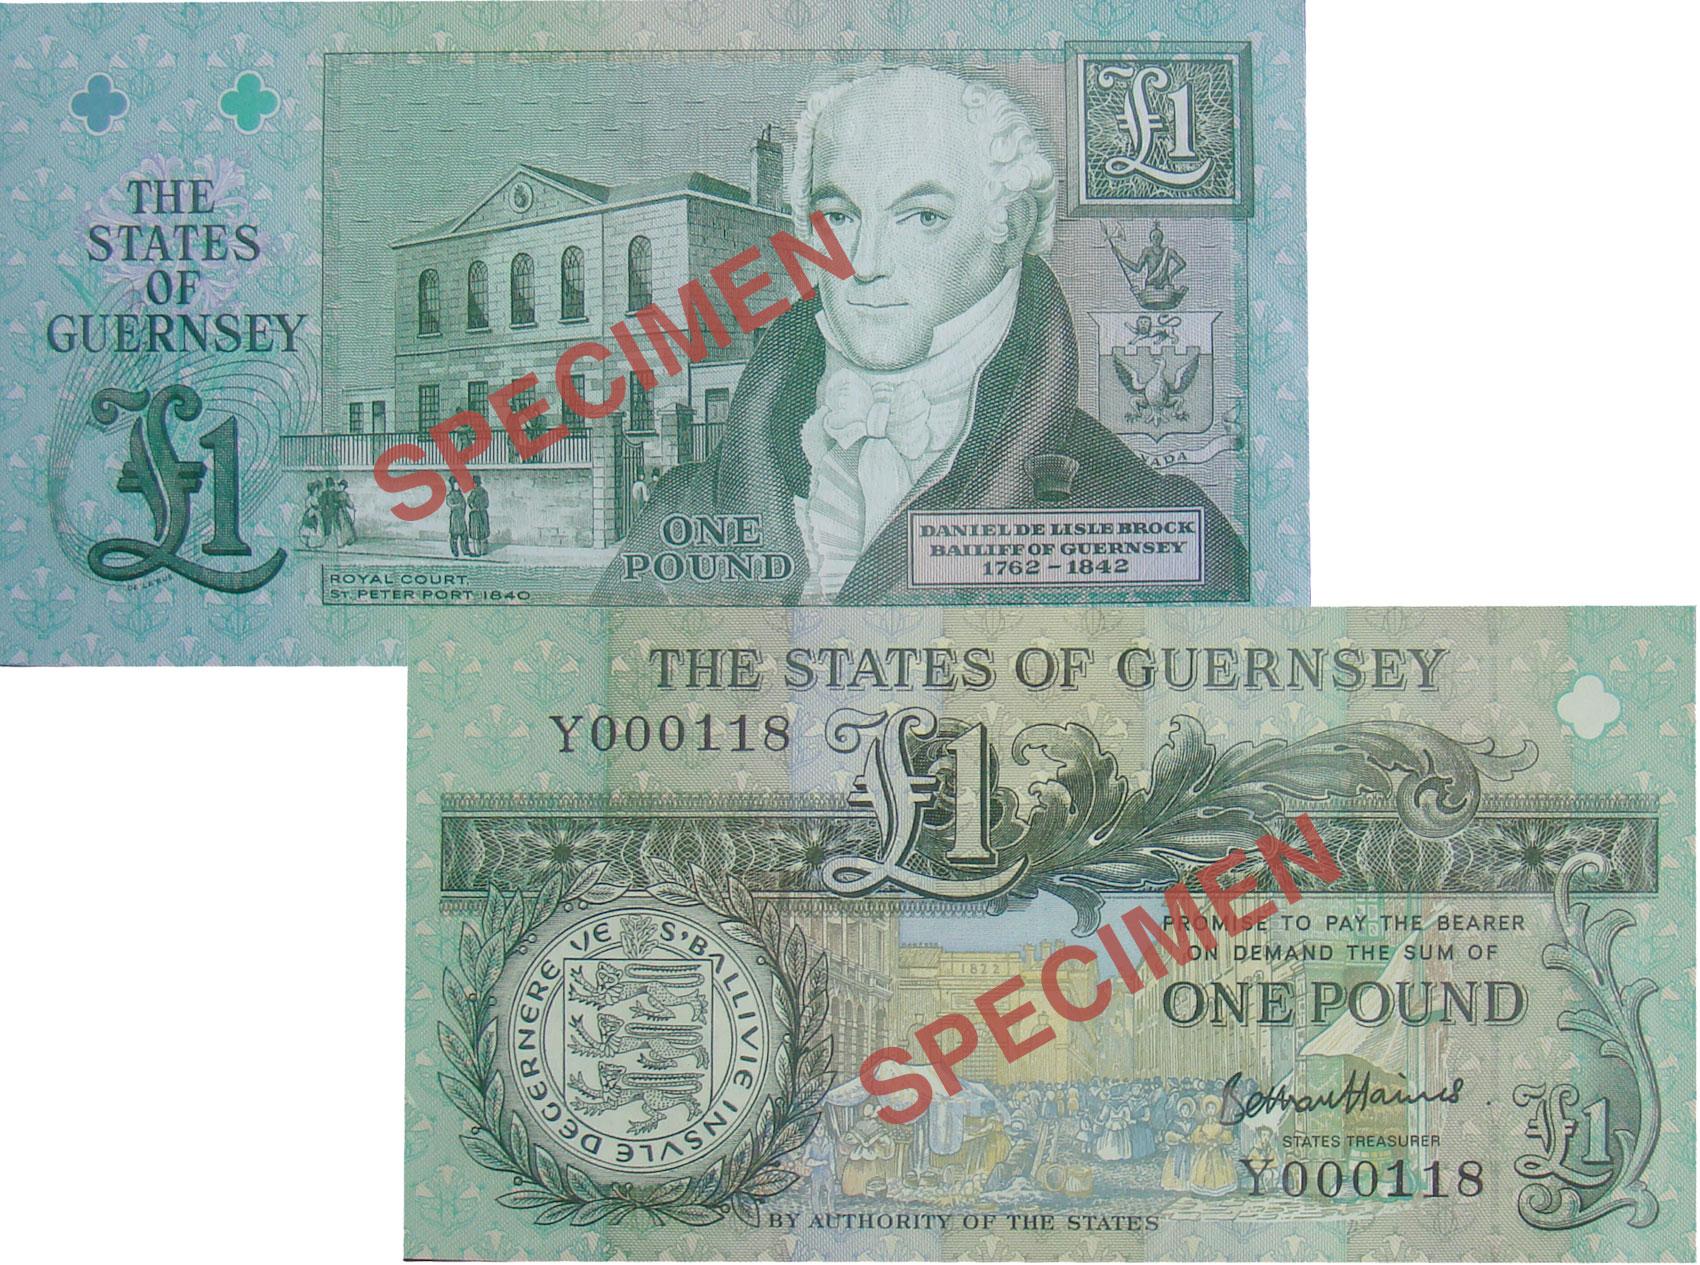 £1 B. Haines signatory Guernsey Bank Note (Y Prefix)